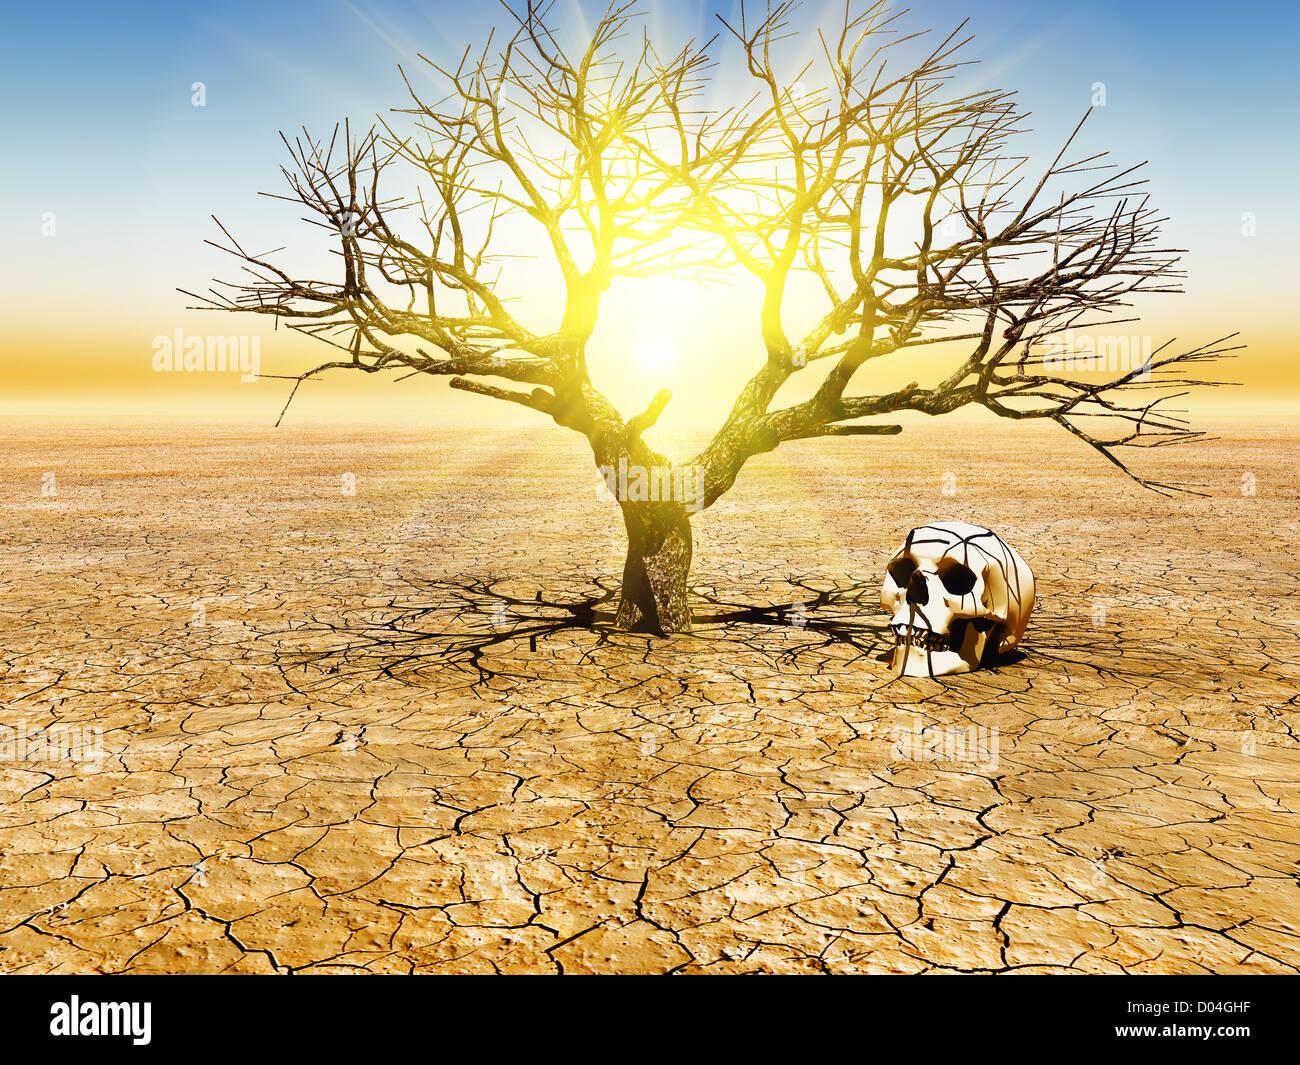 illustration of global warming - Stock Image